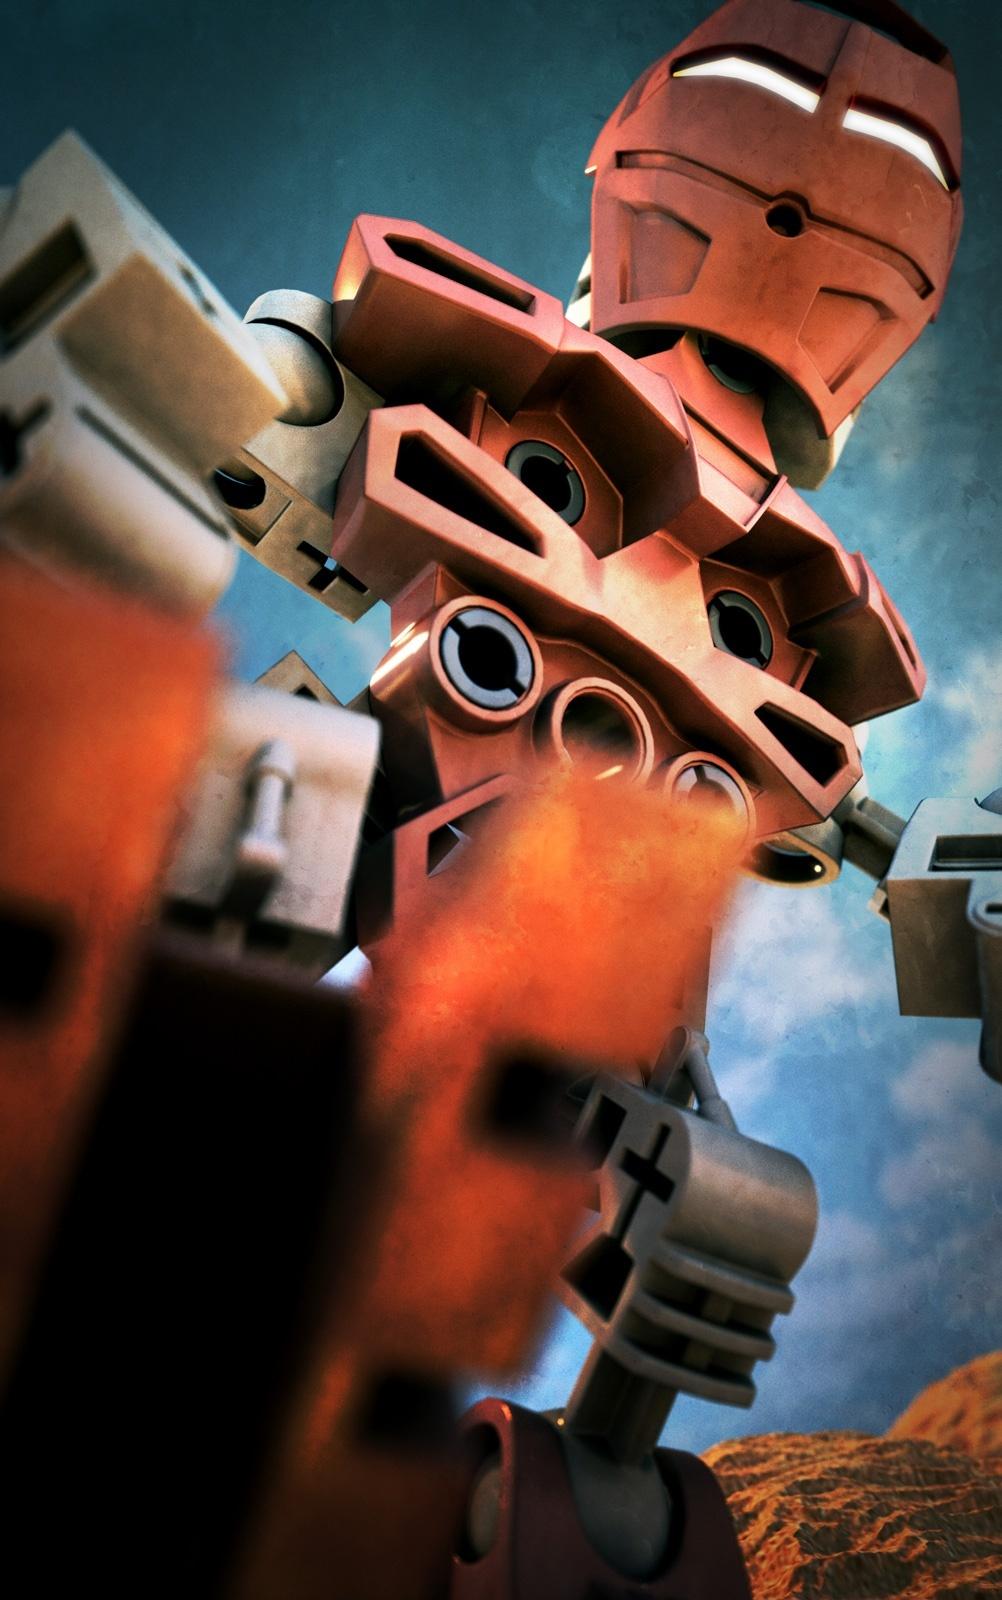 Profusion lego bionicle v2 dot 1 d021ed37 15y8